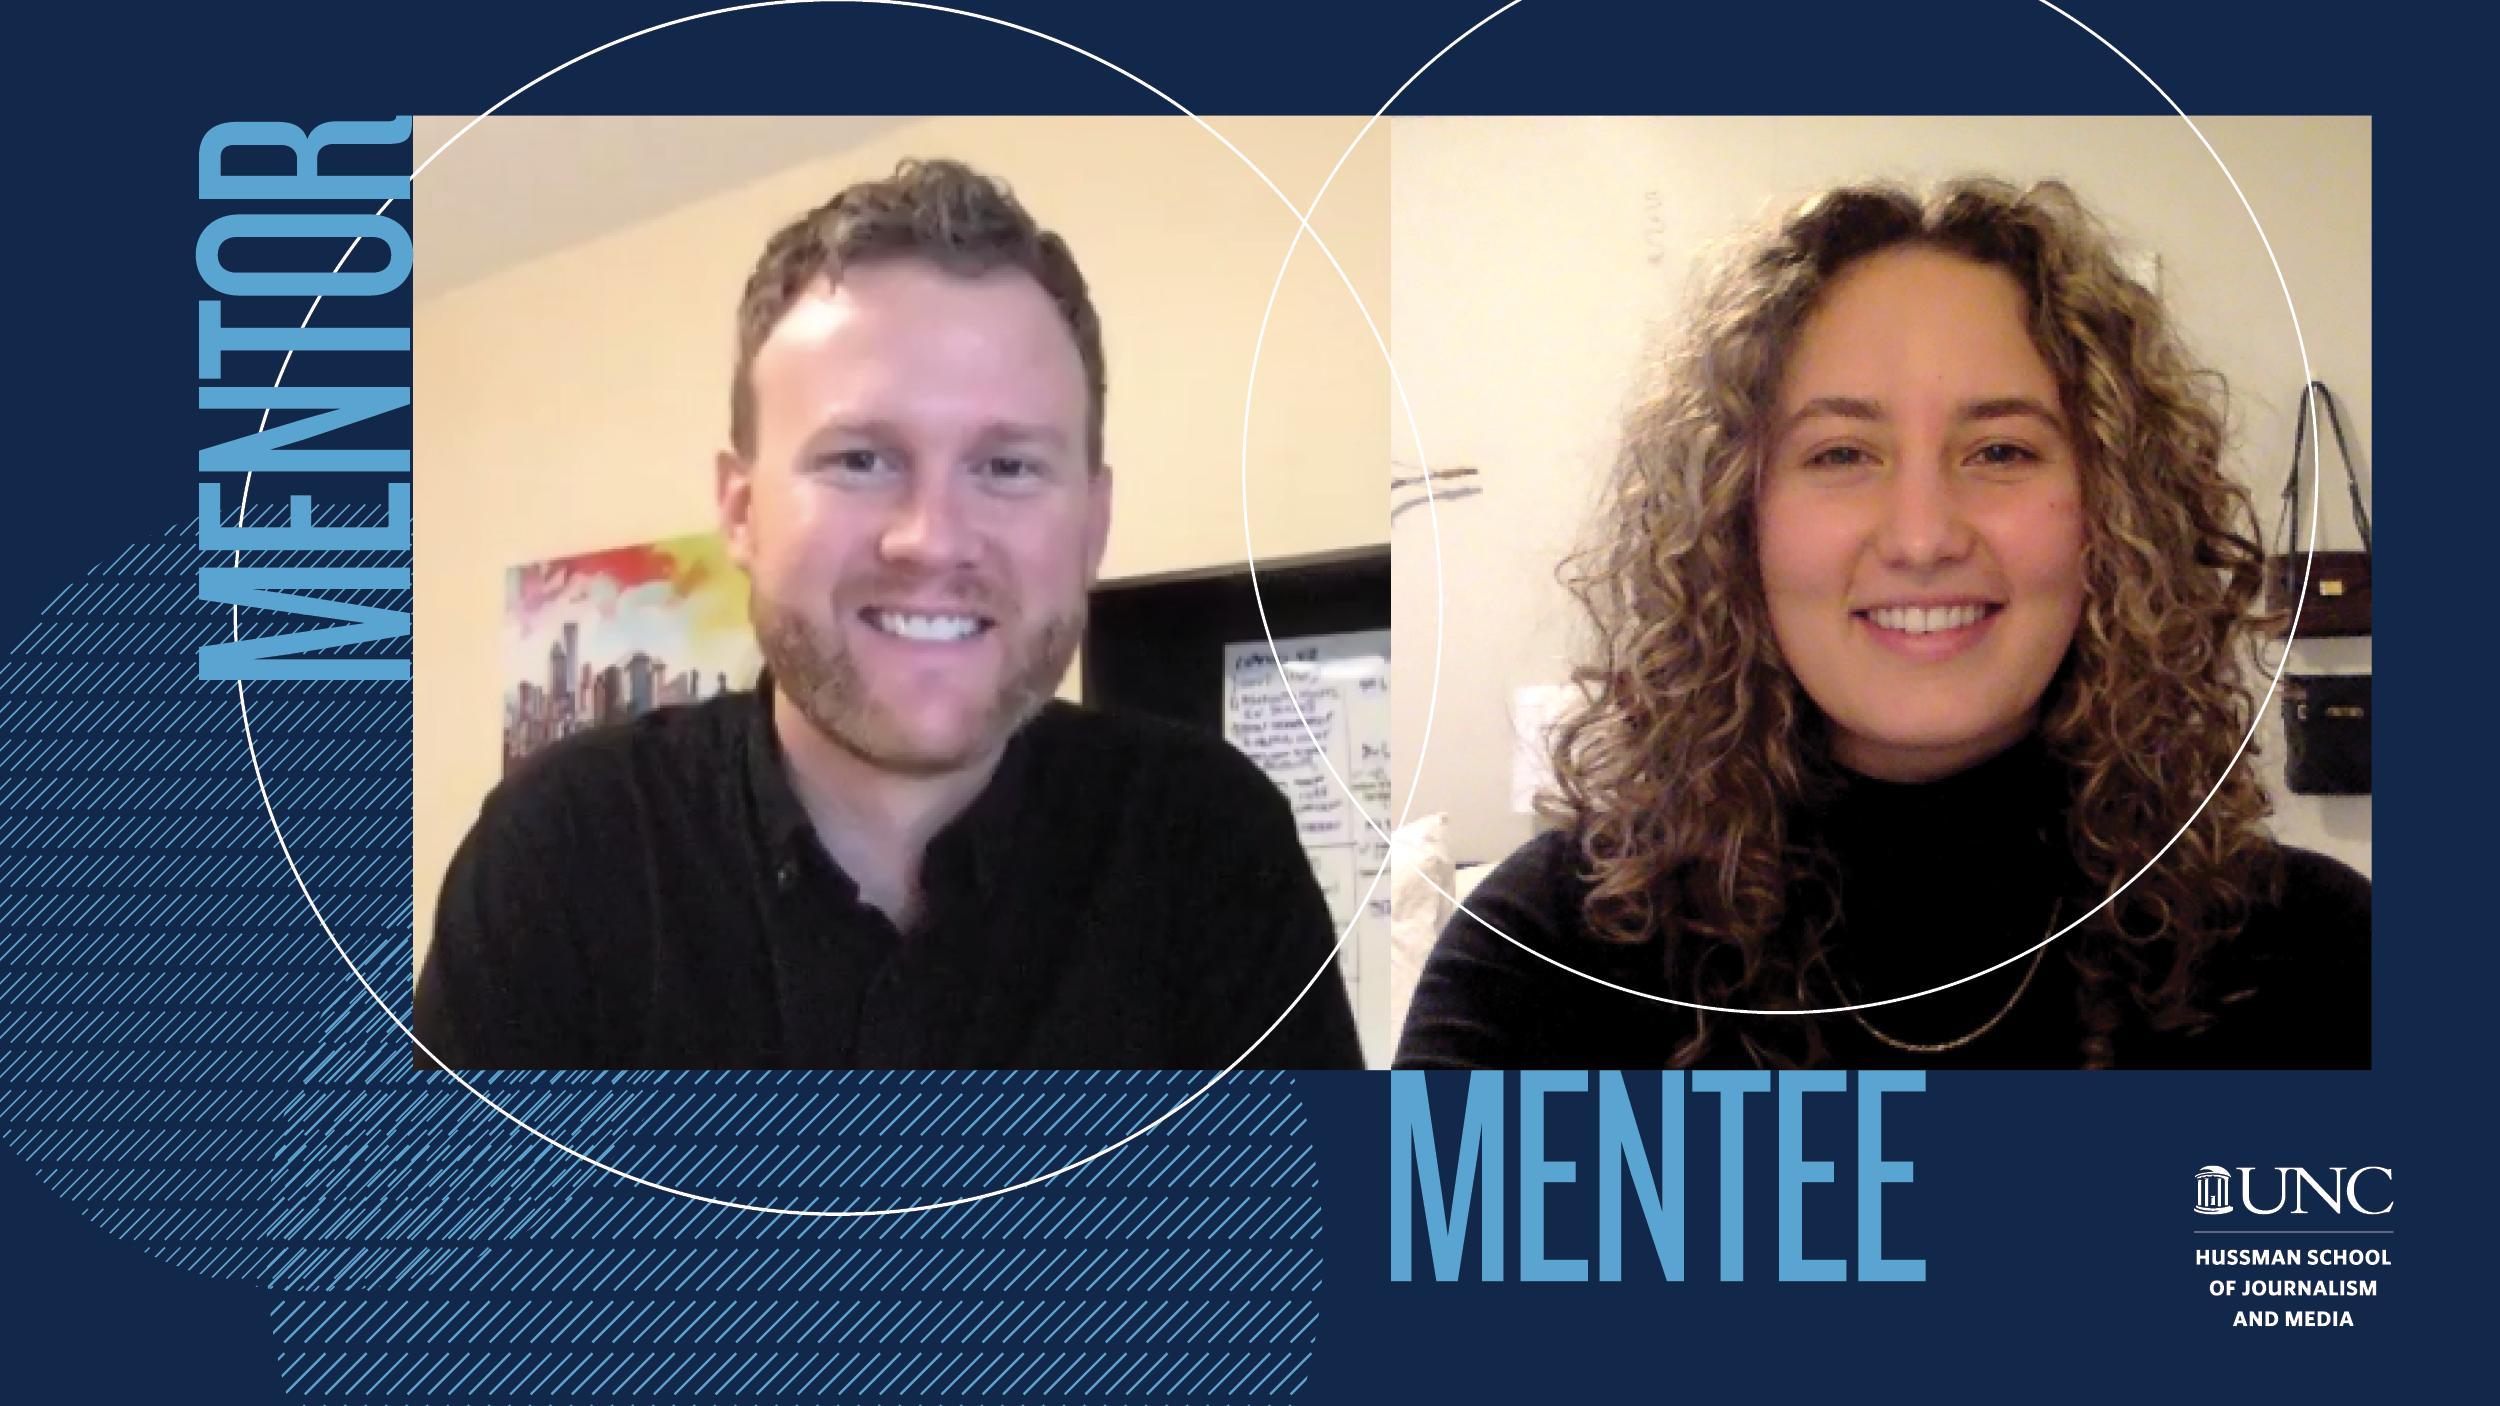 Mentor/mentee pairing Robbie Marshall/Isabel Hewgley